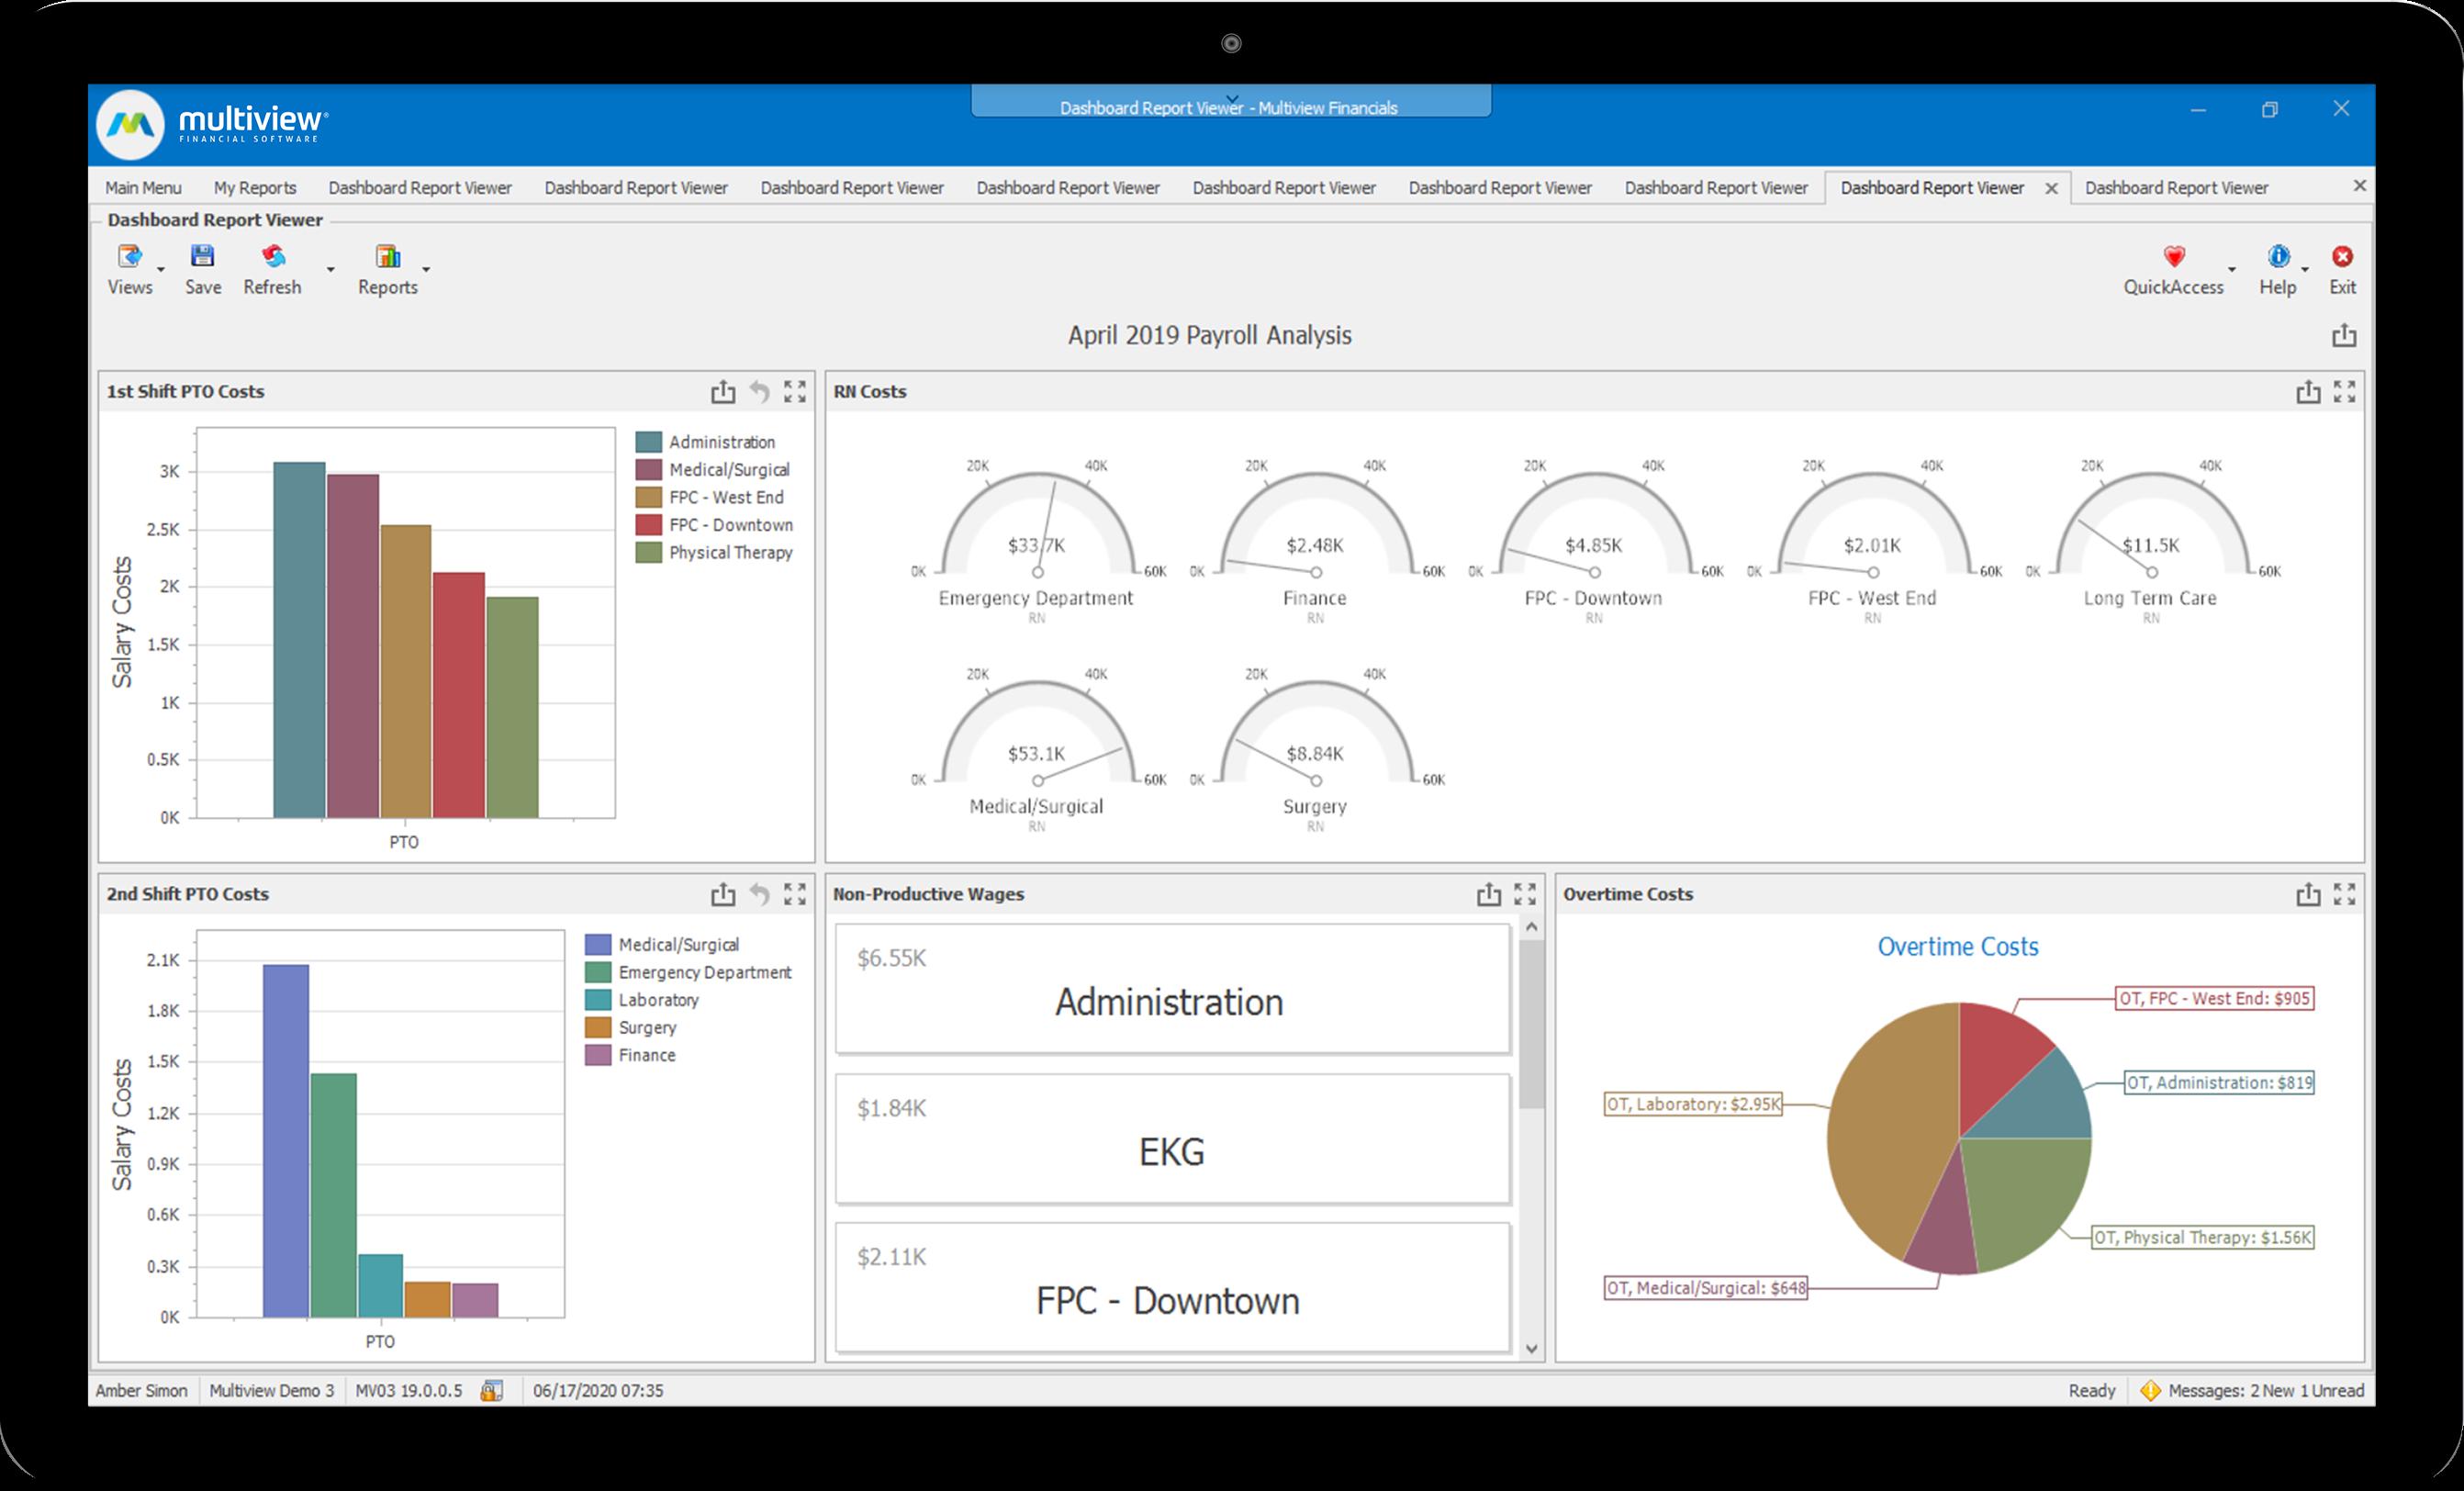 Multiview ERP Software - 5